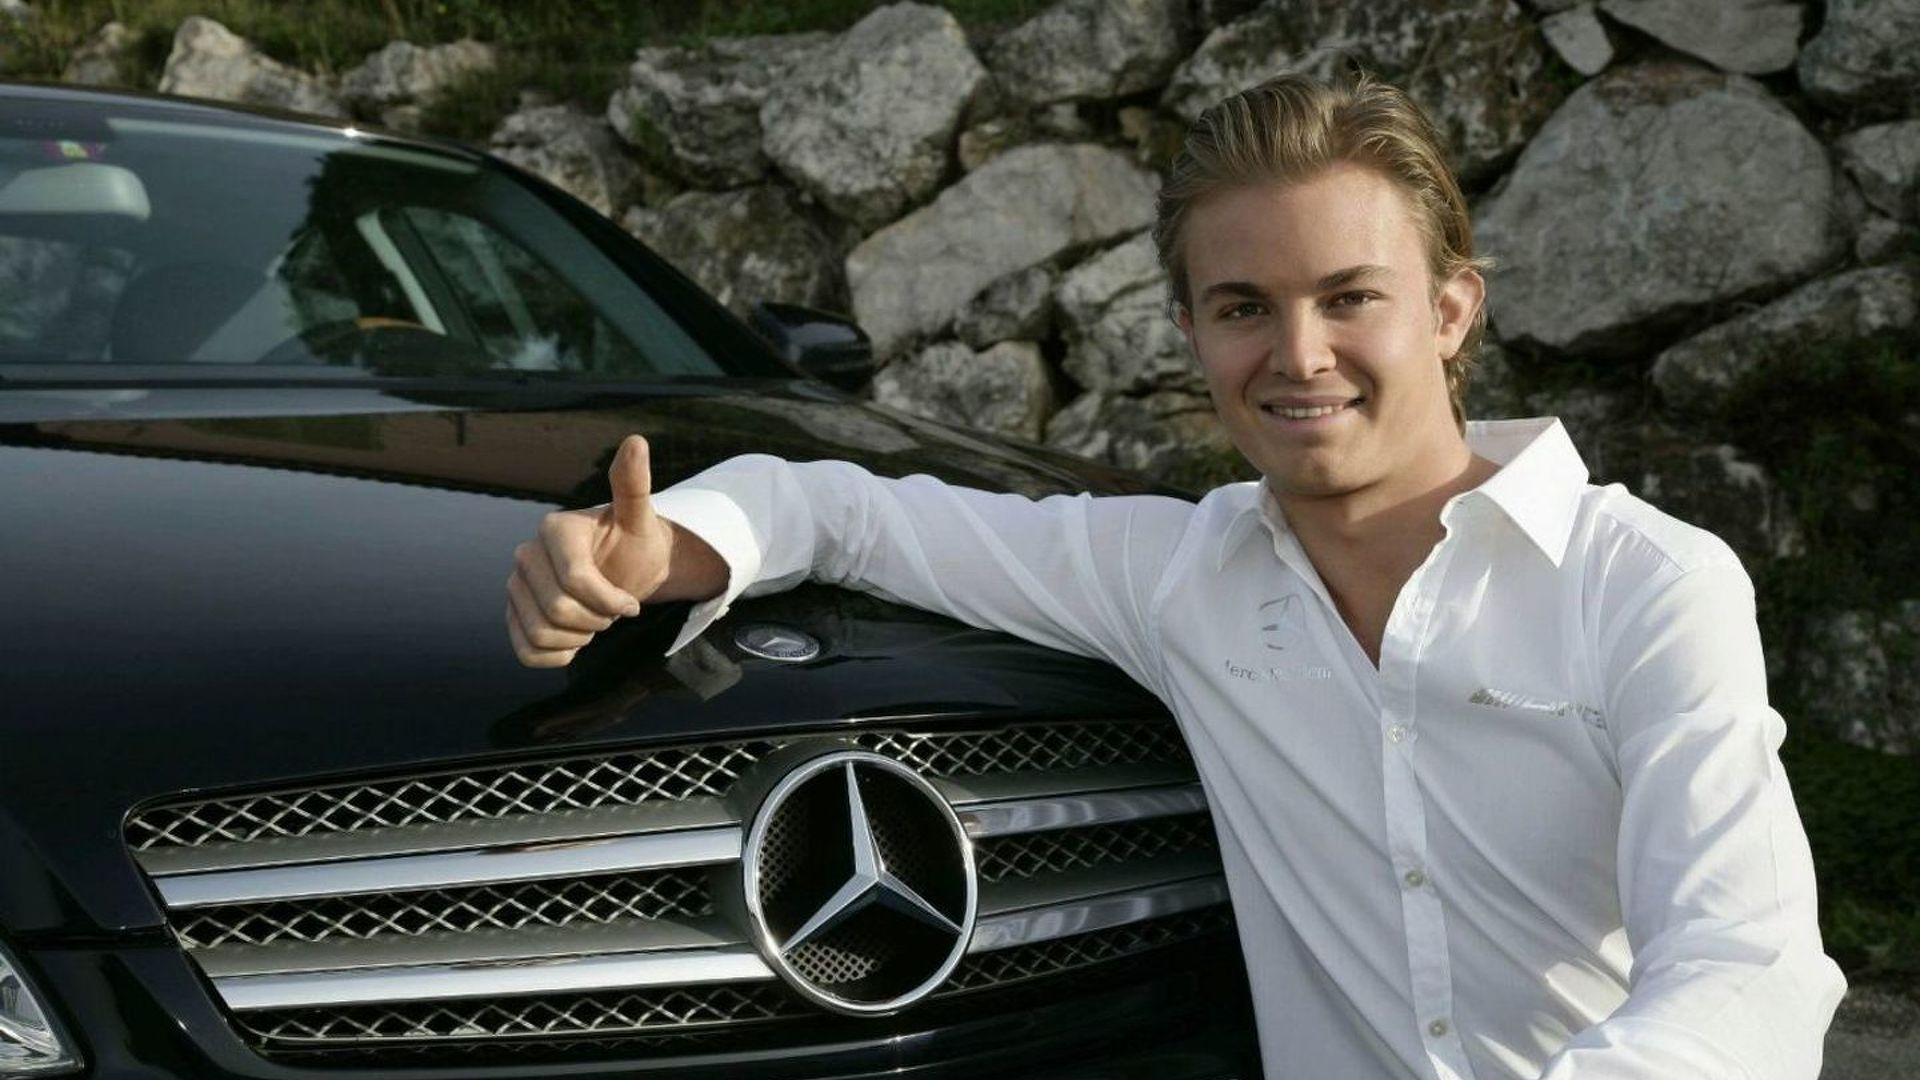 Brawn backs Rosberg to replace Button